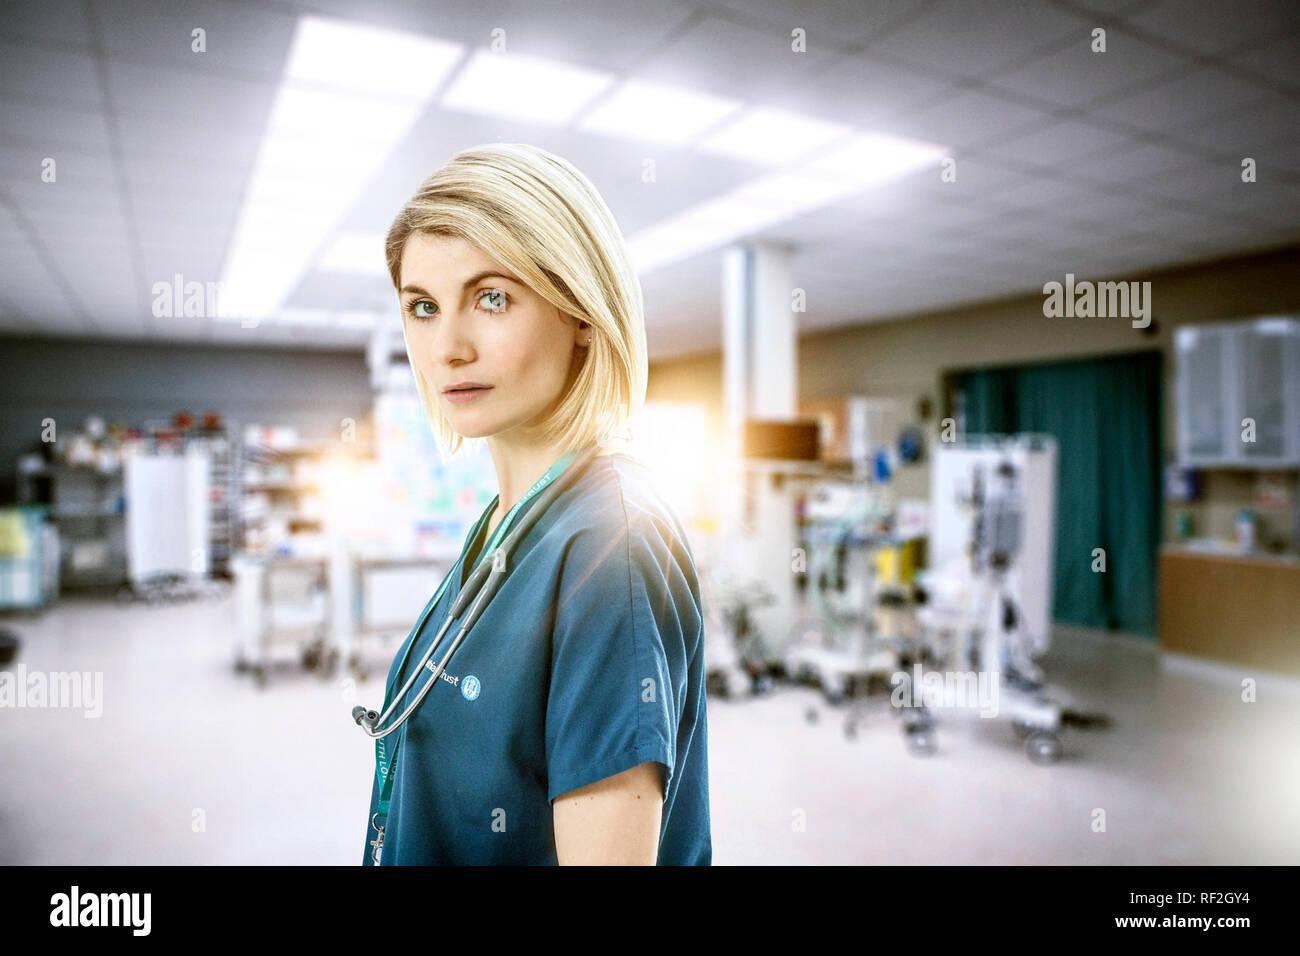 Prod DB © Mark Mainz - BBC One - Red Production Company / DR SECRET MEDICAL TRUST ME mini serie TV creee par Dan Sefton 2017- GB saison 1 Jodie Whittaker. femme chirurgien; doctoresse; femme docteur; surgeon woman; doctor - Stock Image